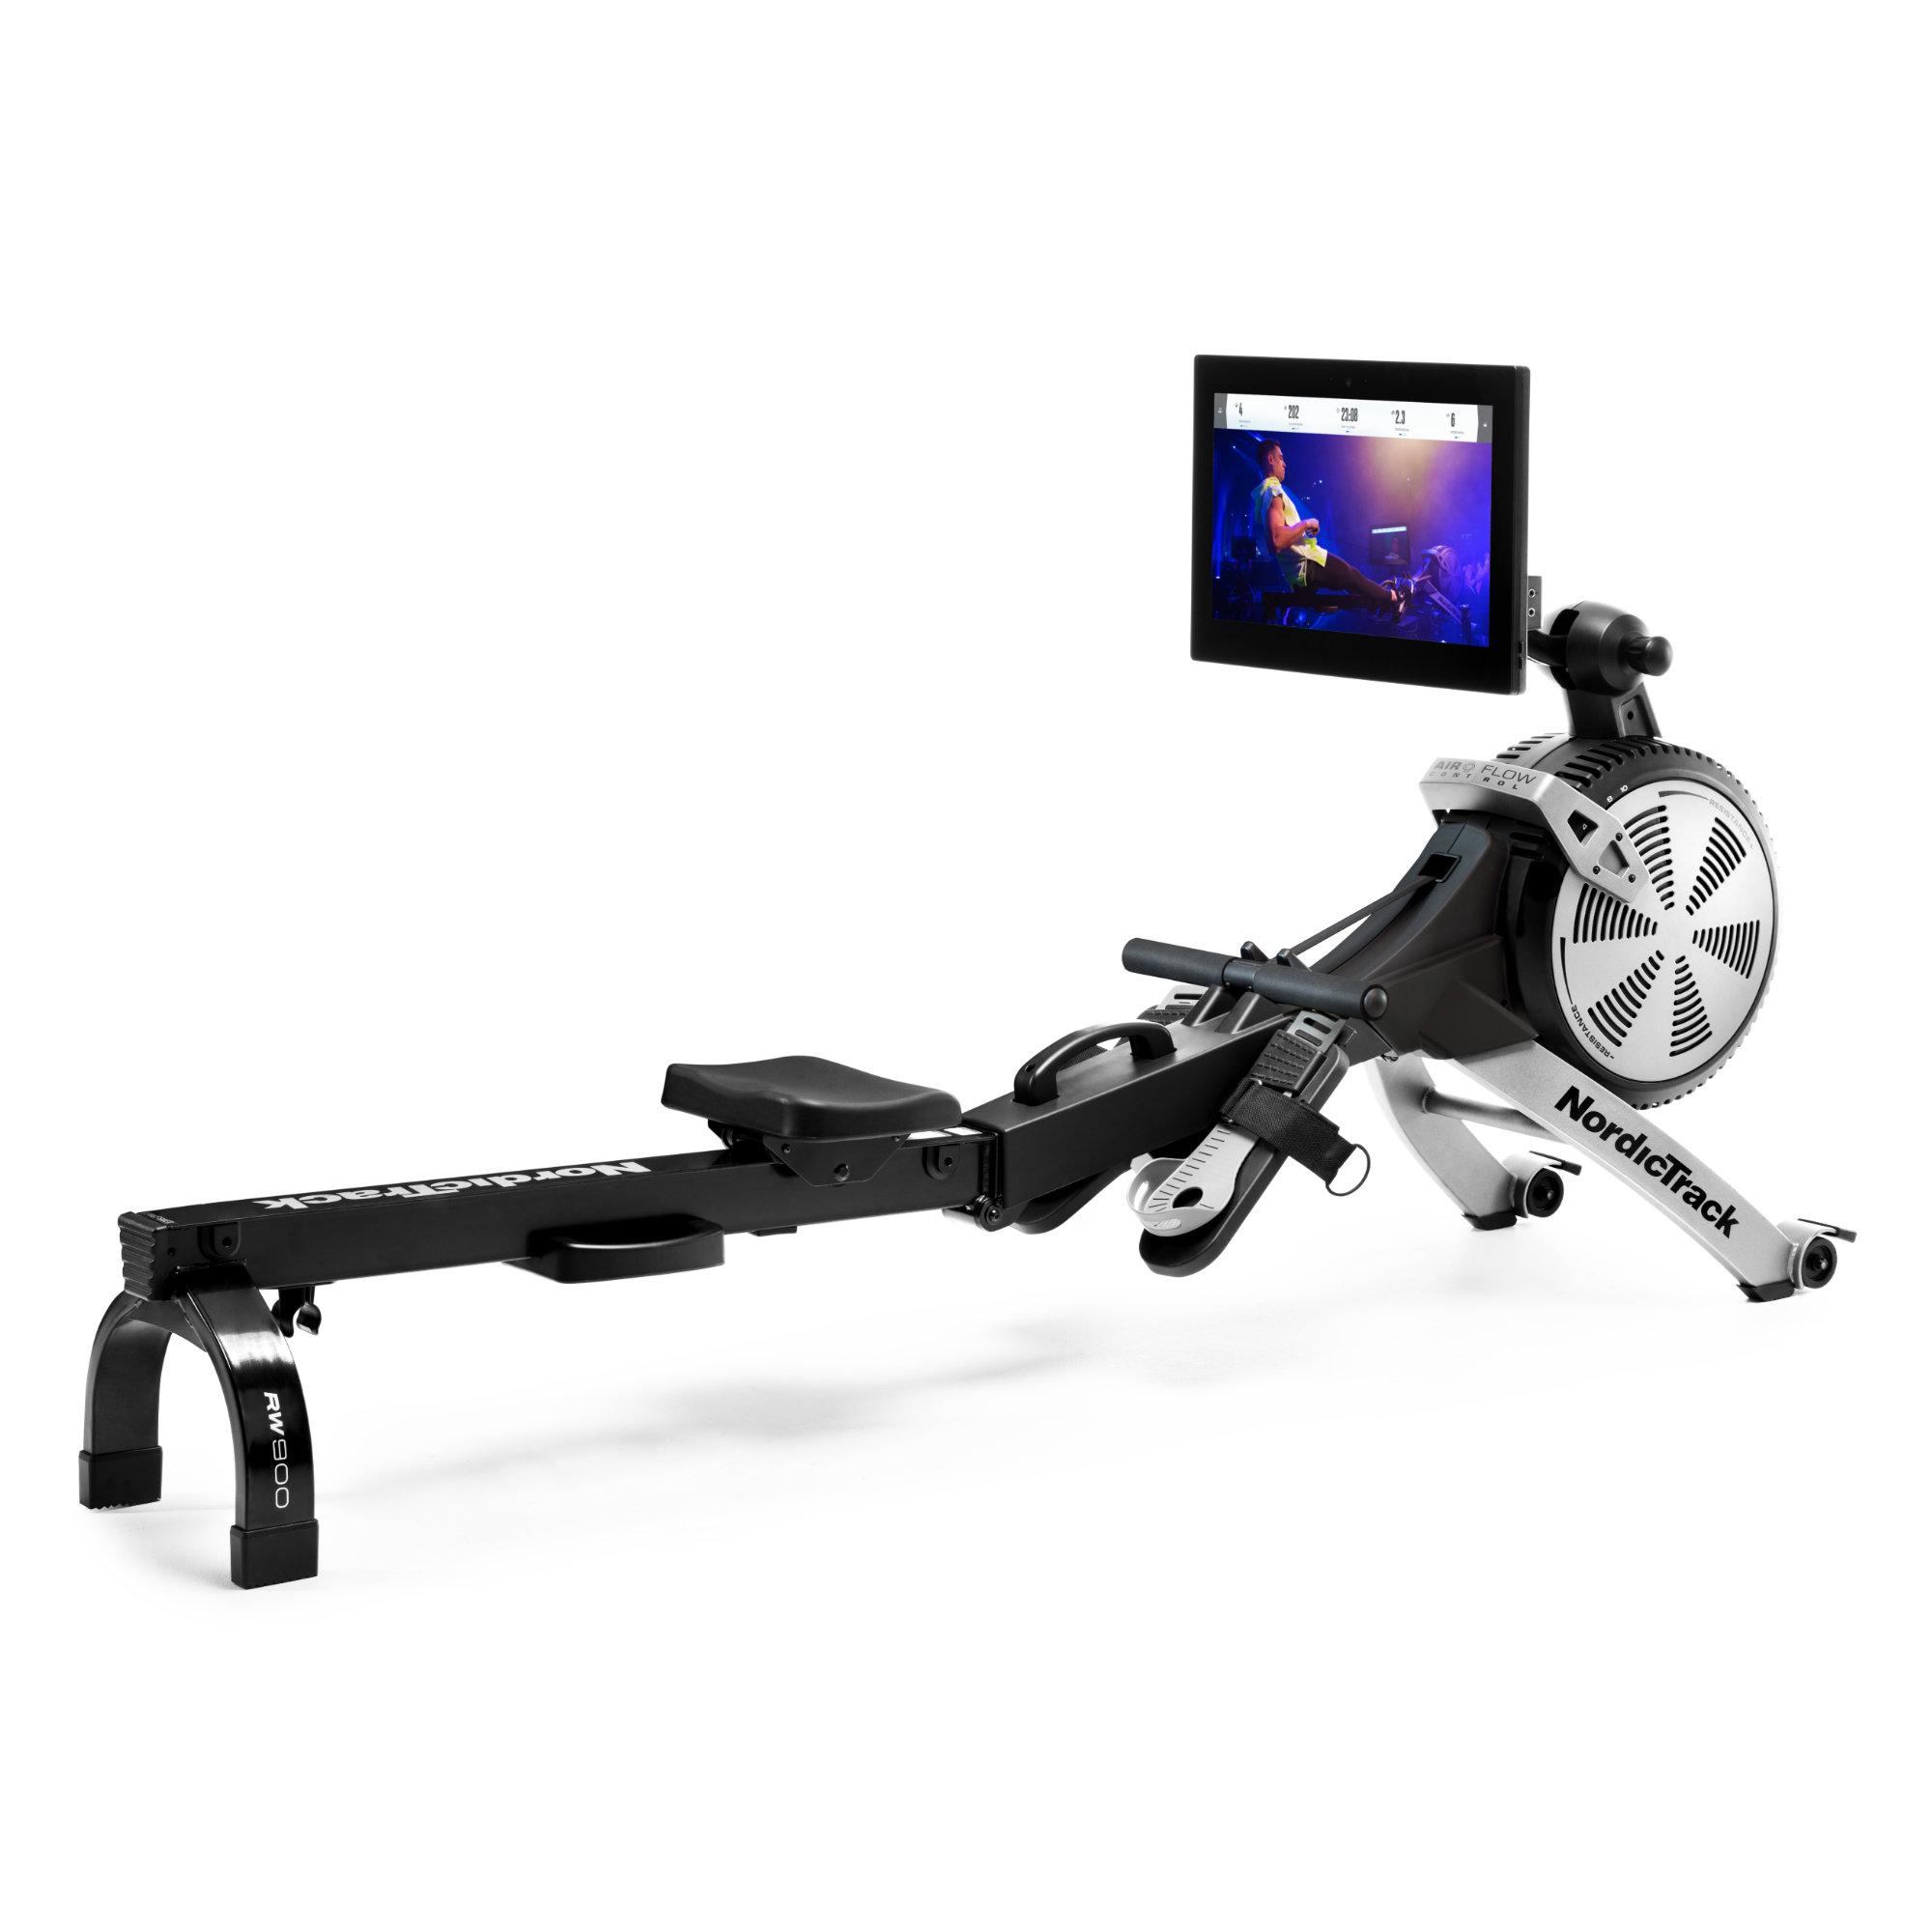 NordicTrack RW900 Rowing Machine